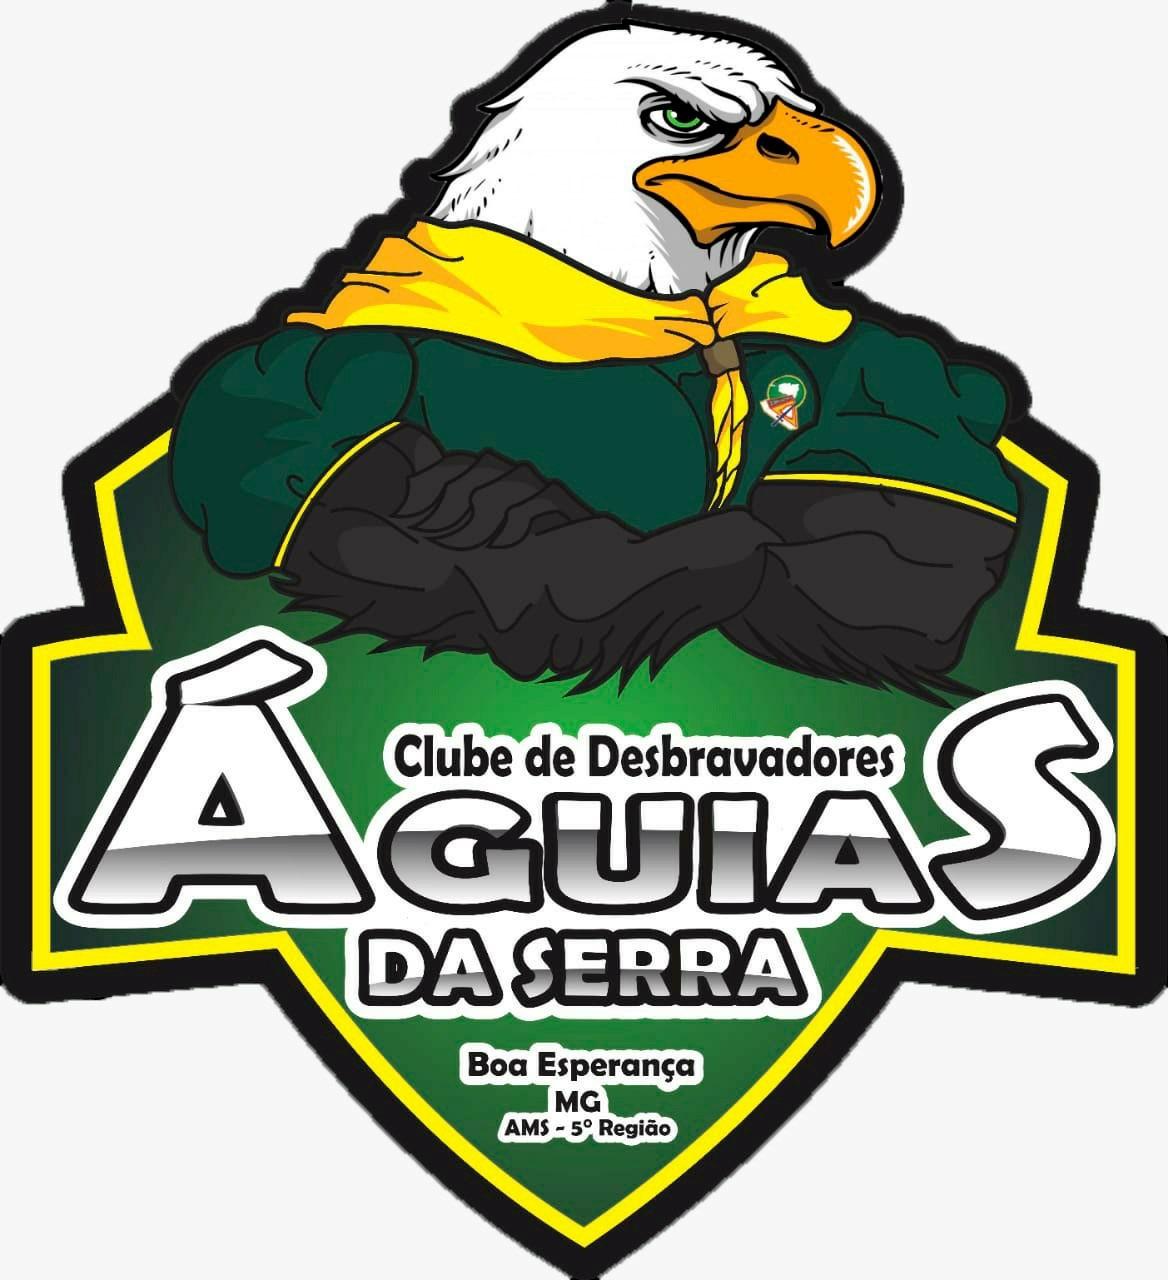 Aguias da Serra